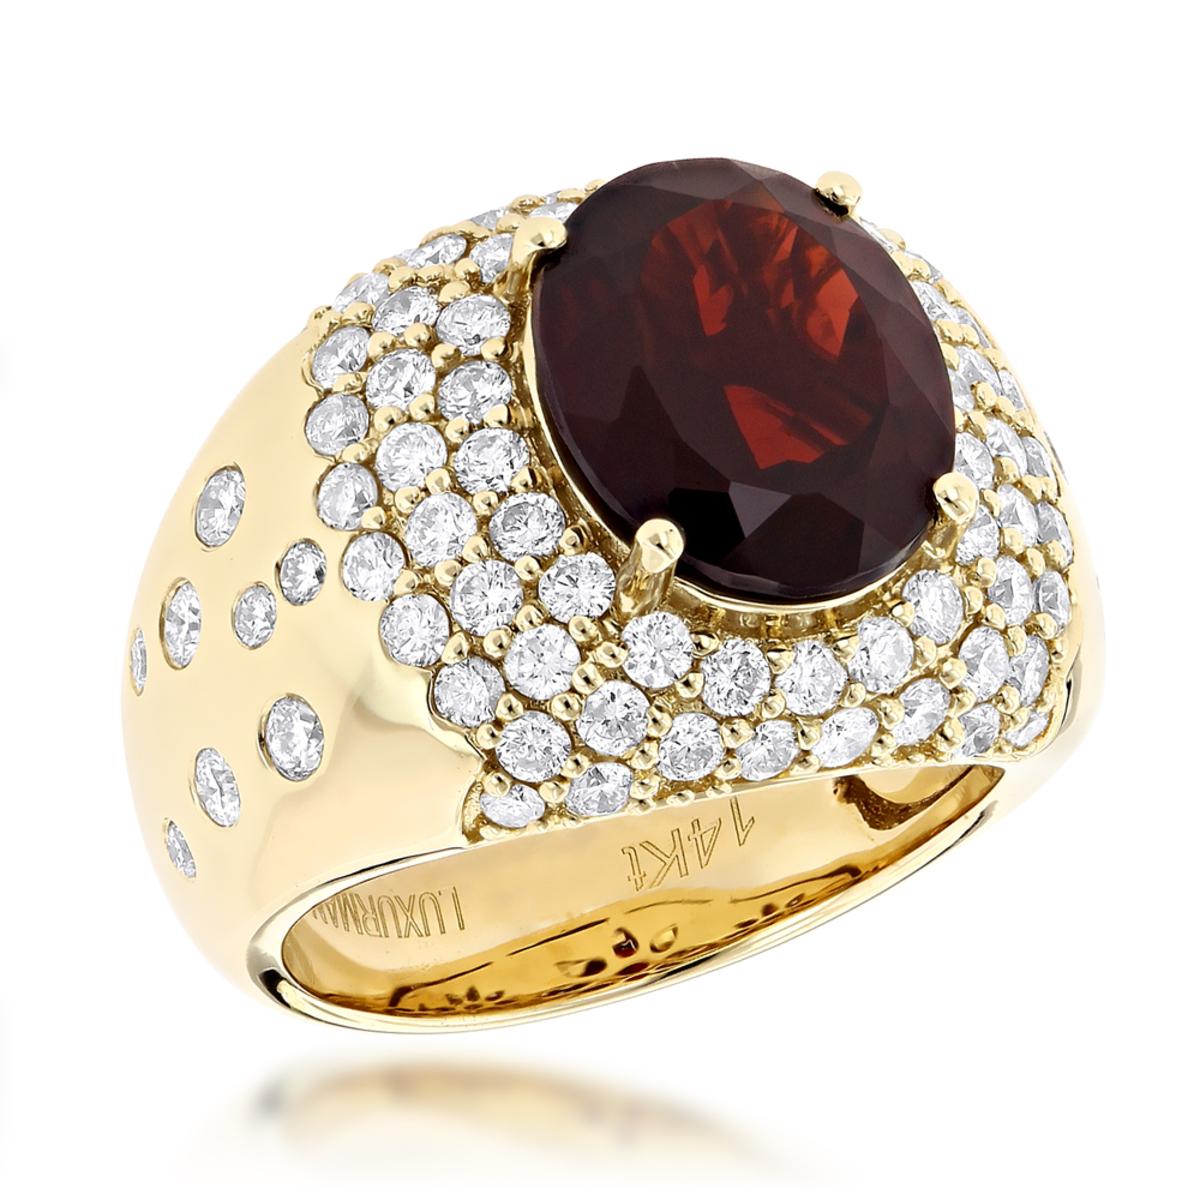 Designer Jewelry Luxurman Fashion Ladies Garnet Diamond Ring 14K Gold 2.3ct